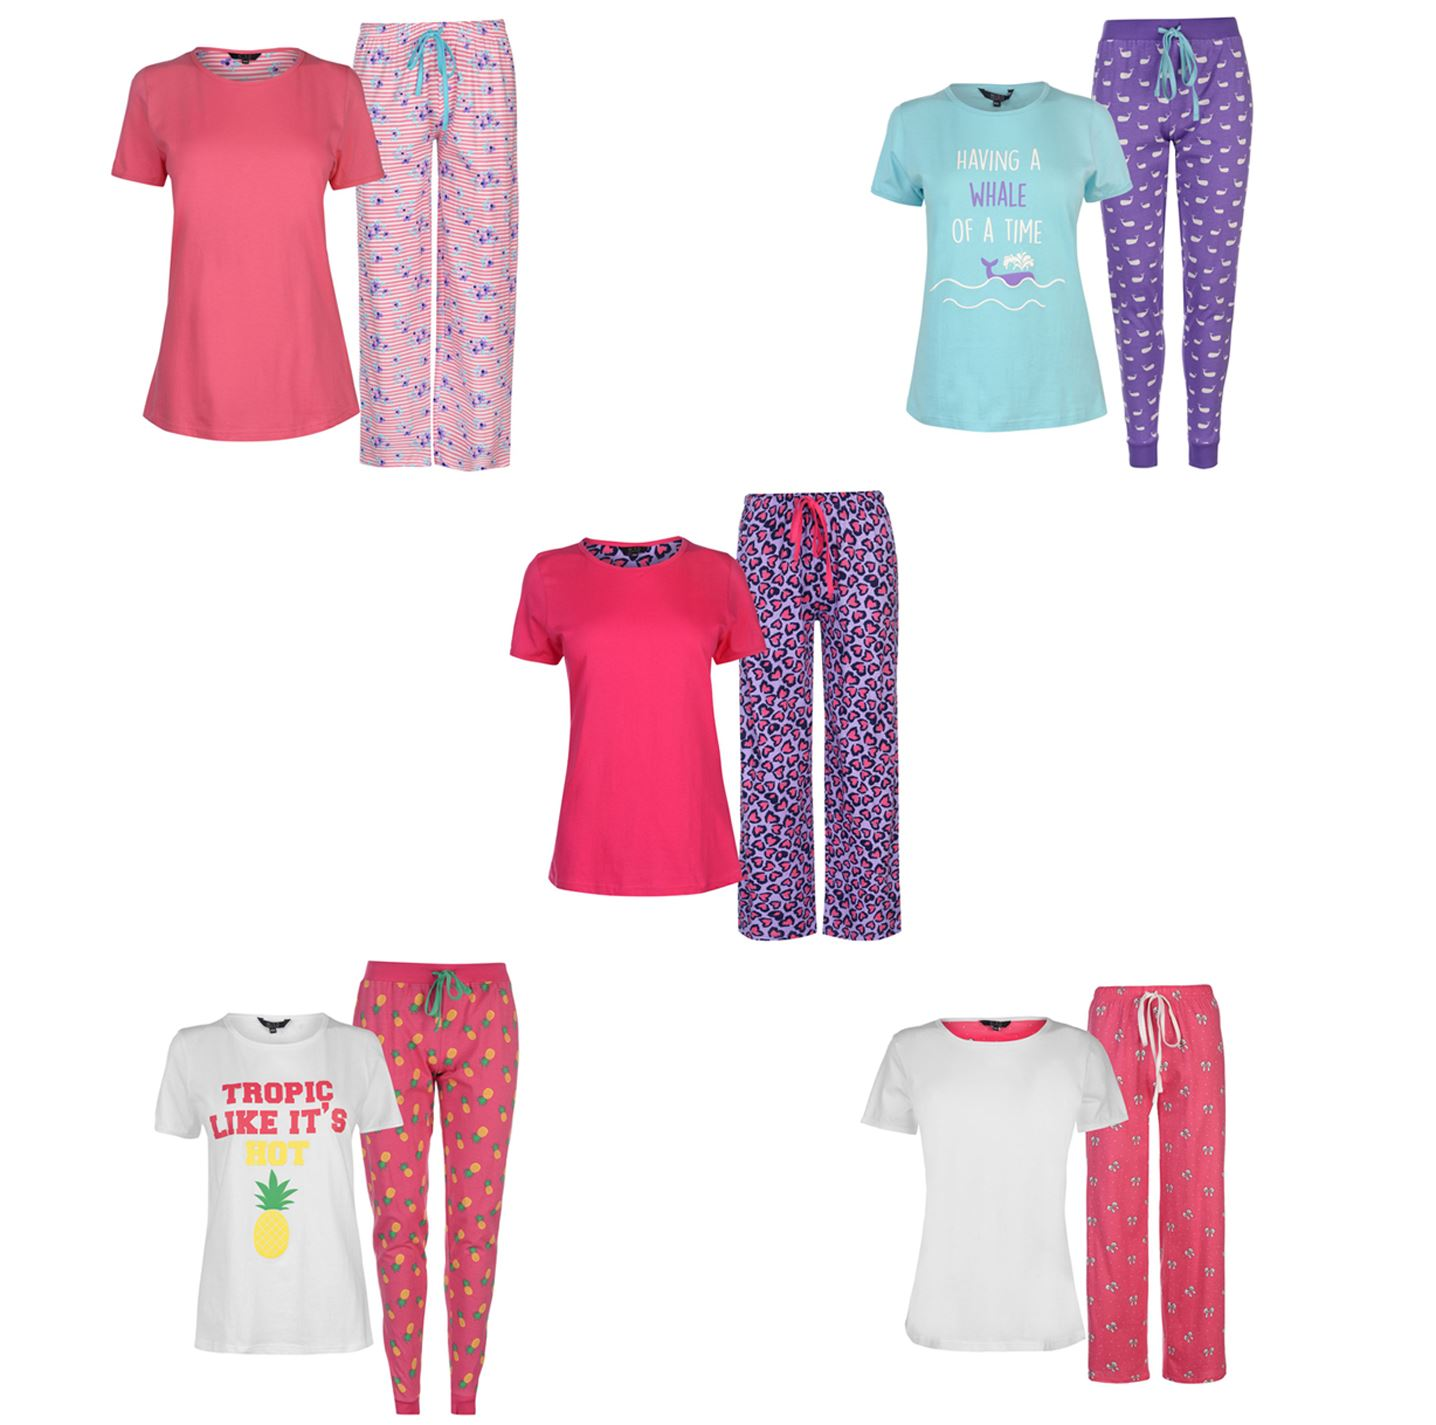 cfd9a1991ea6 ... Miso Table Pyjama Set Ladies Tops Pajamas Womens Sleepwear ...